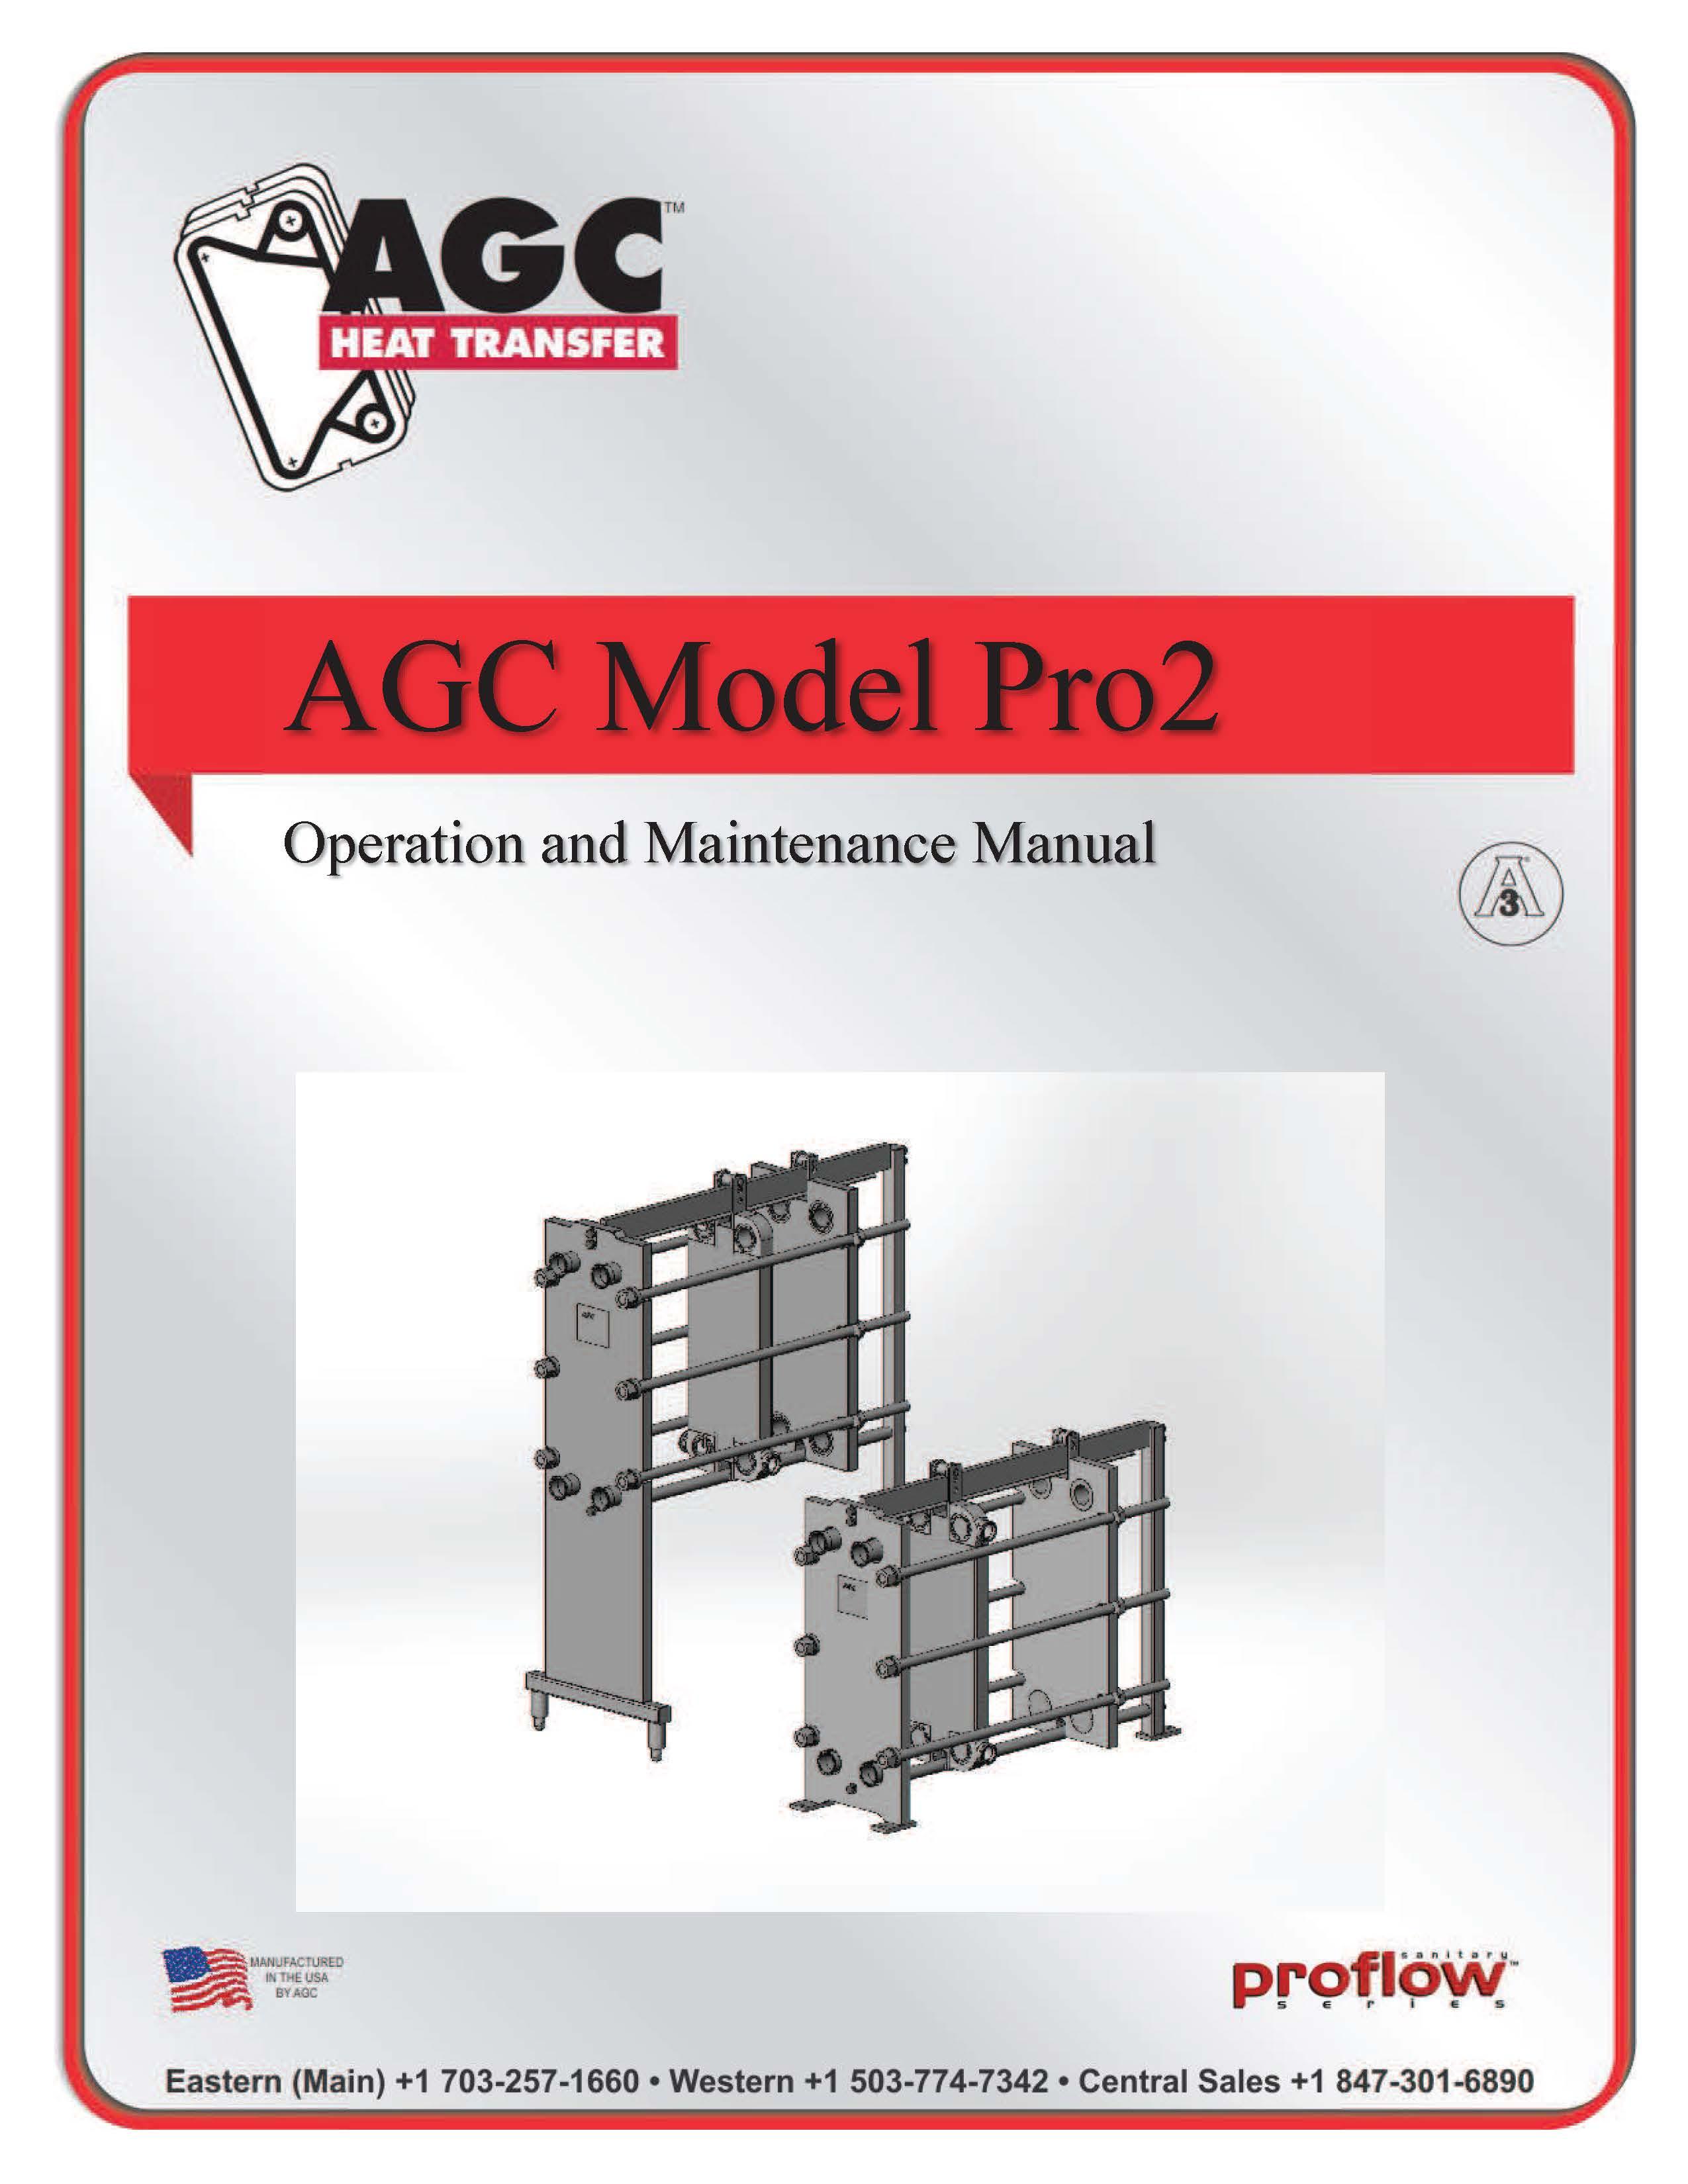 AGC Operating Manual Pro2